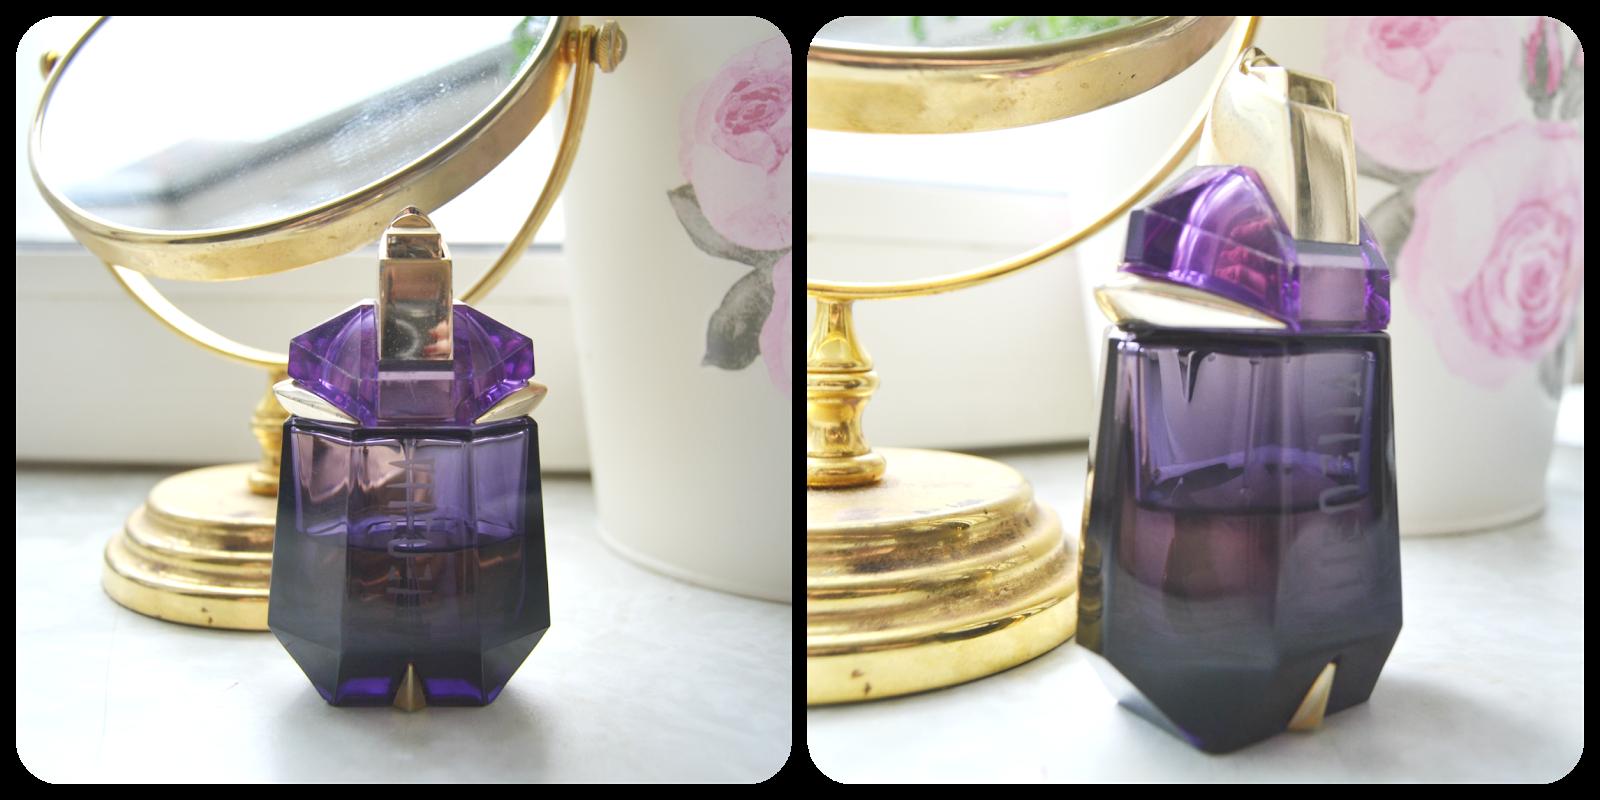 Alien Thierry Mugler Fragrance Parfum